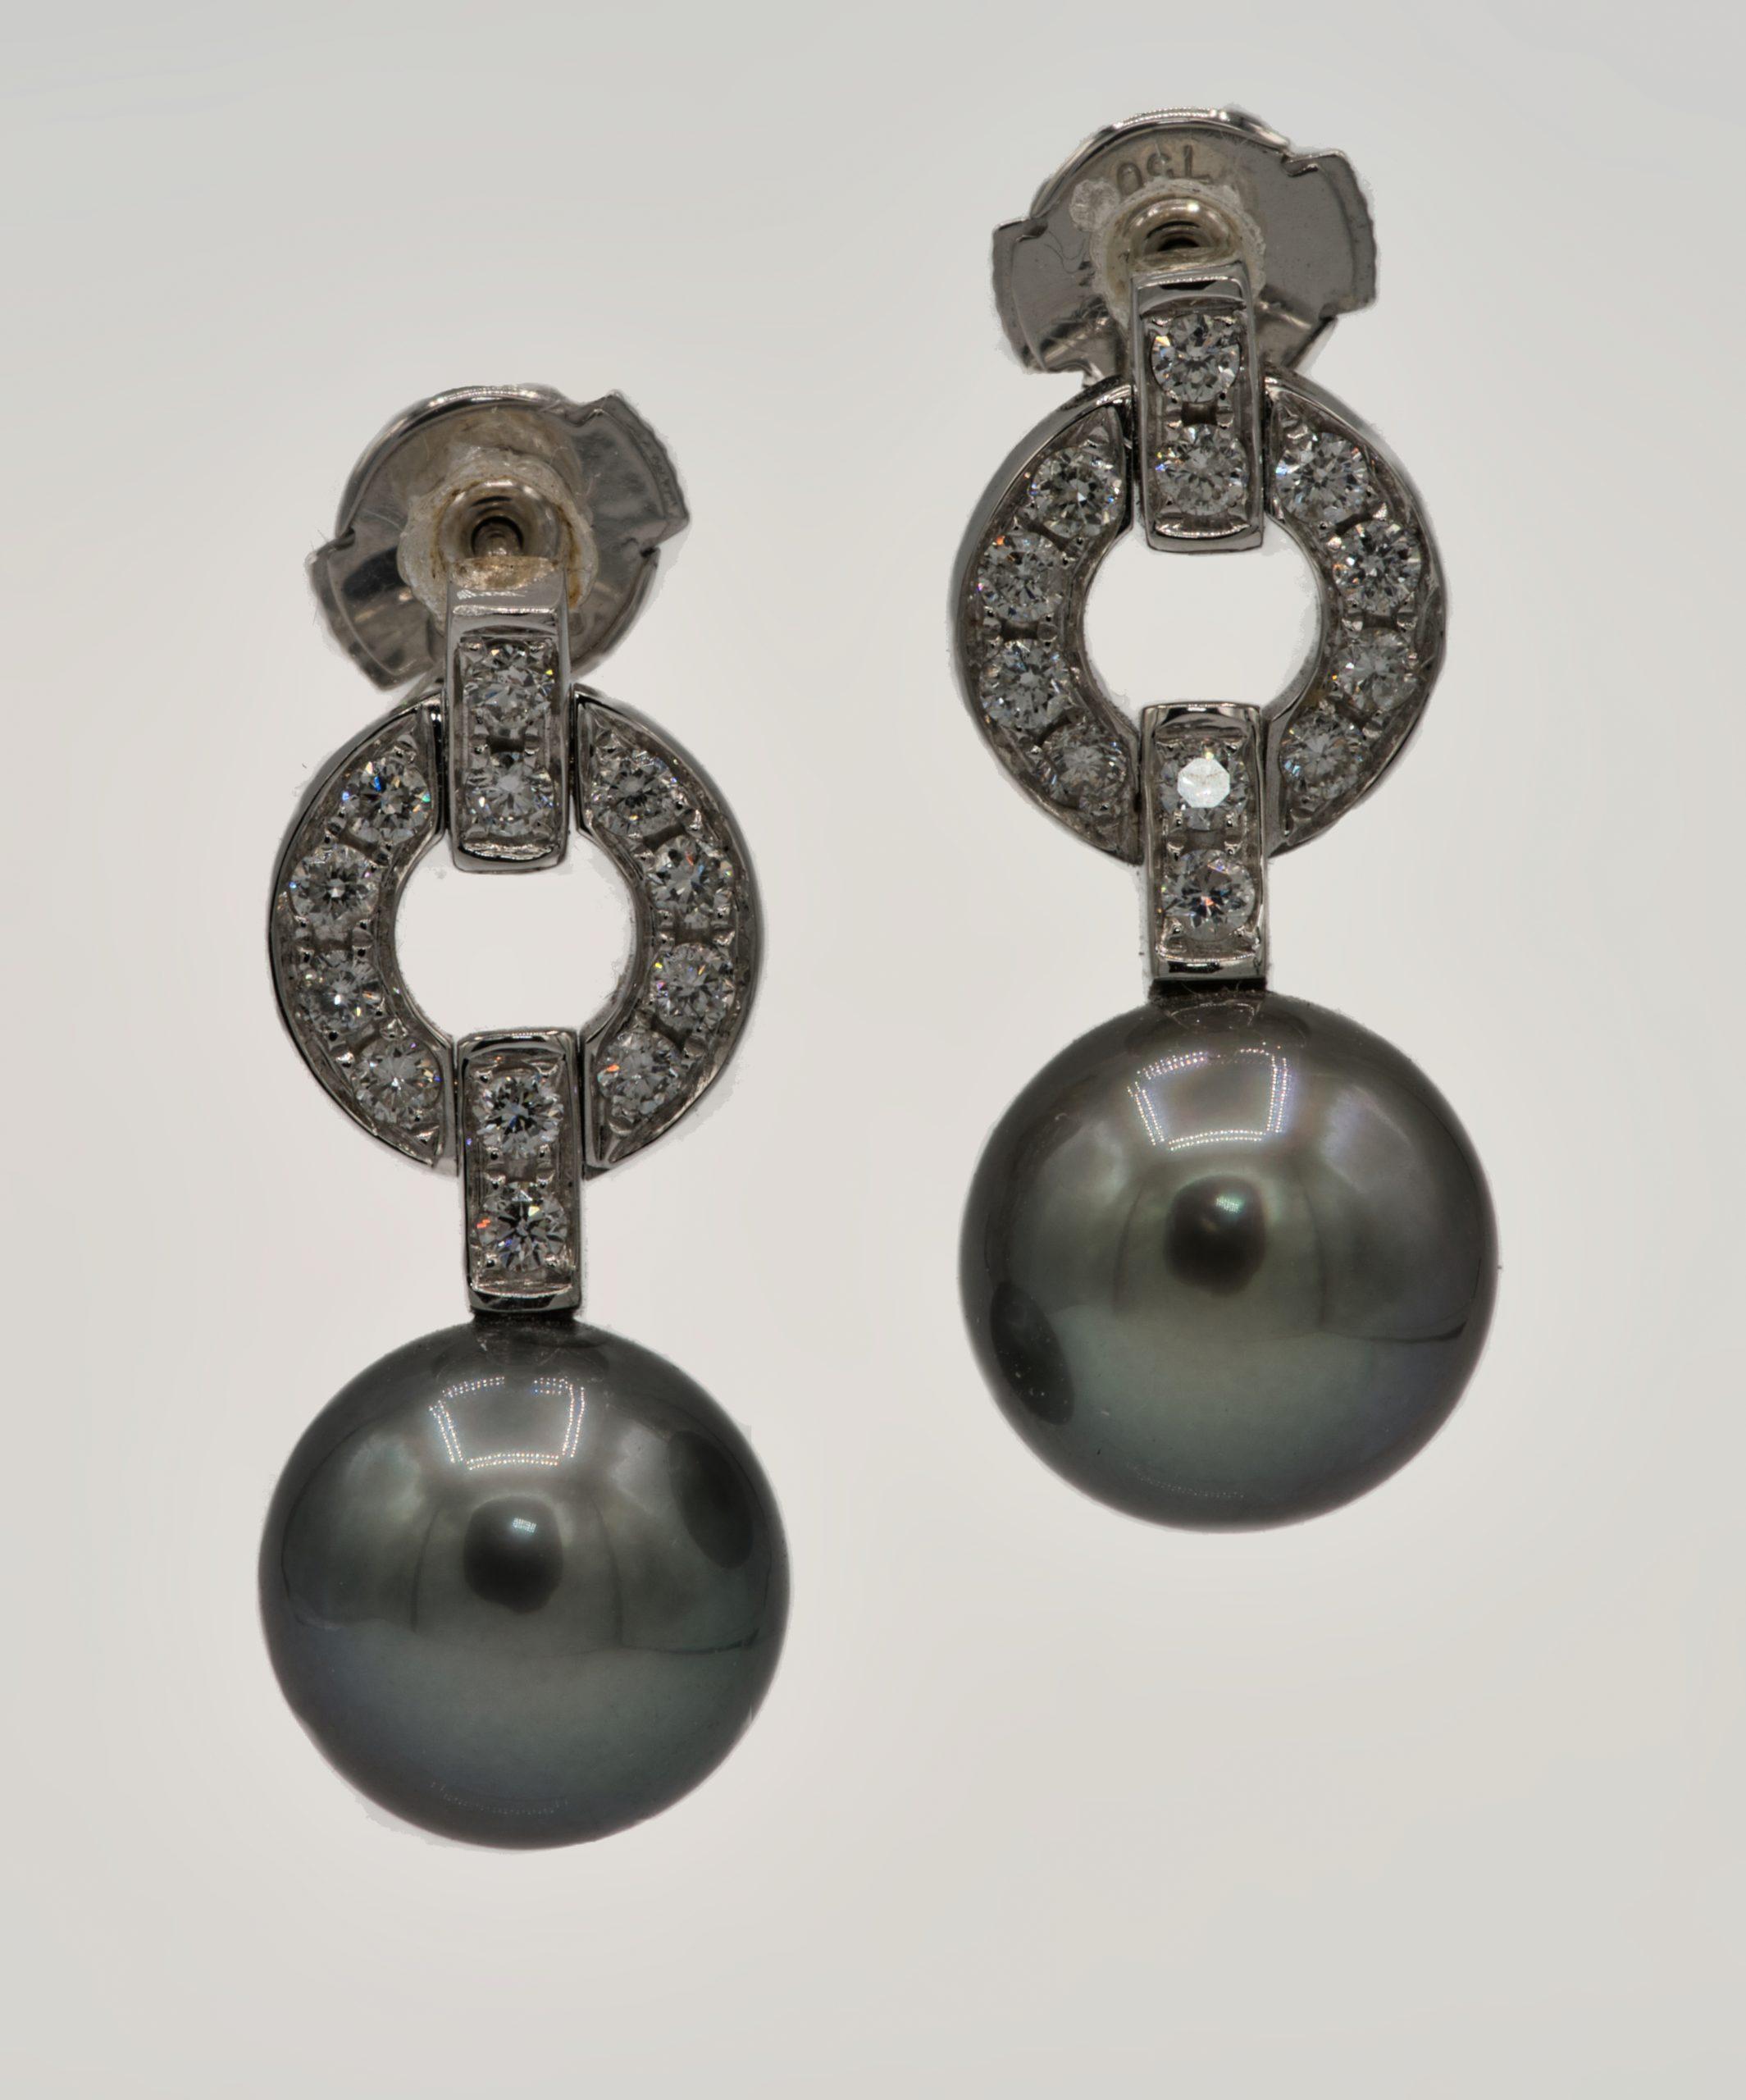 jewellers in horsham